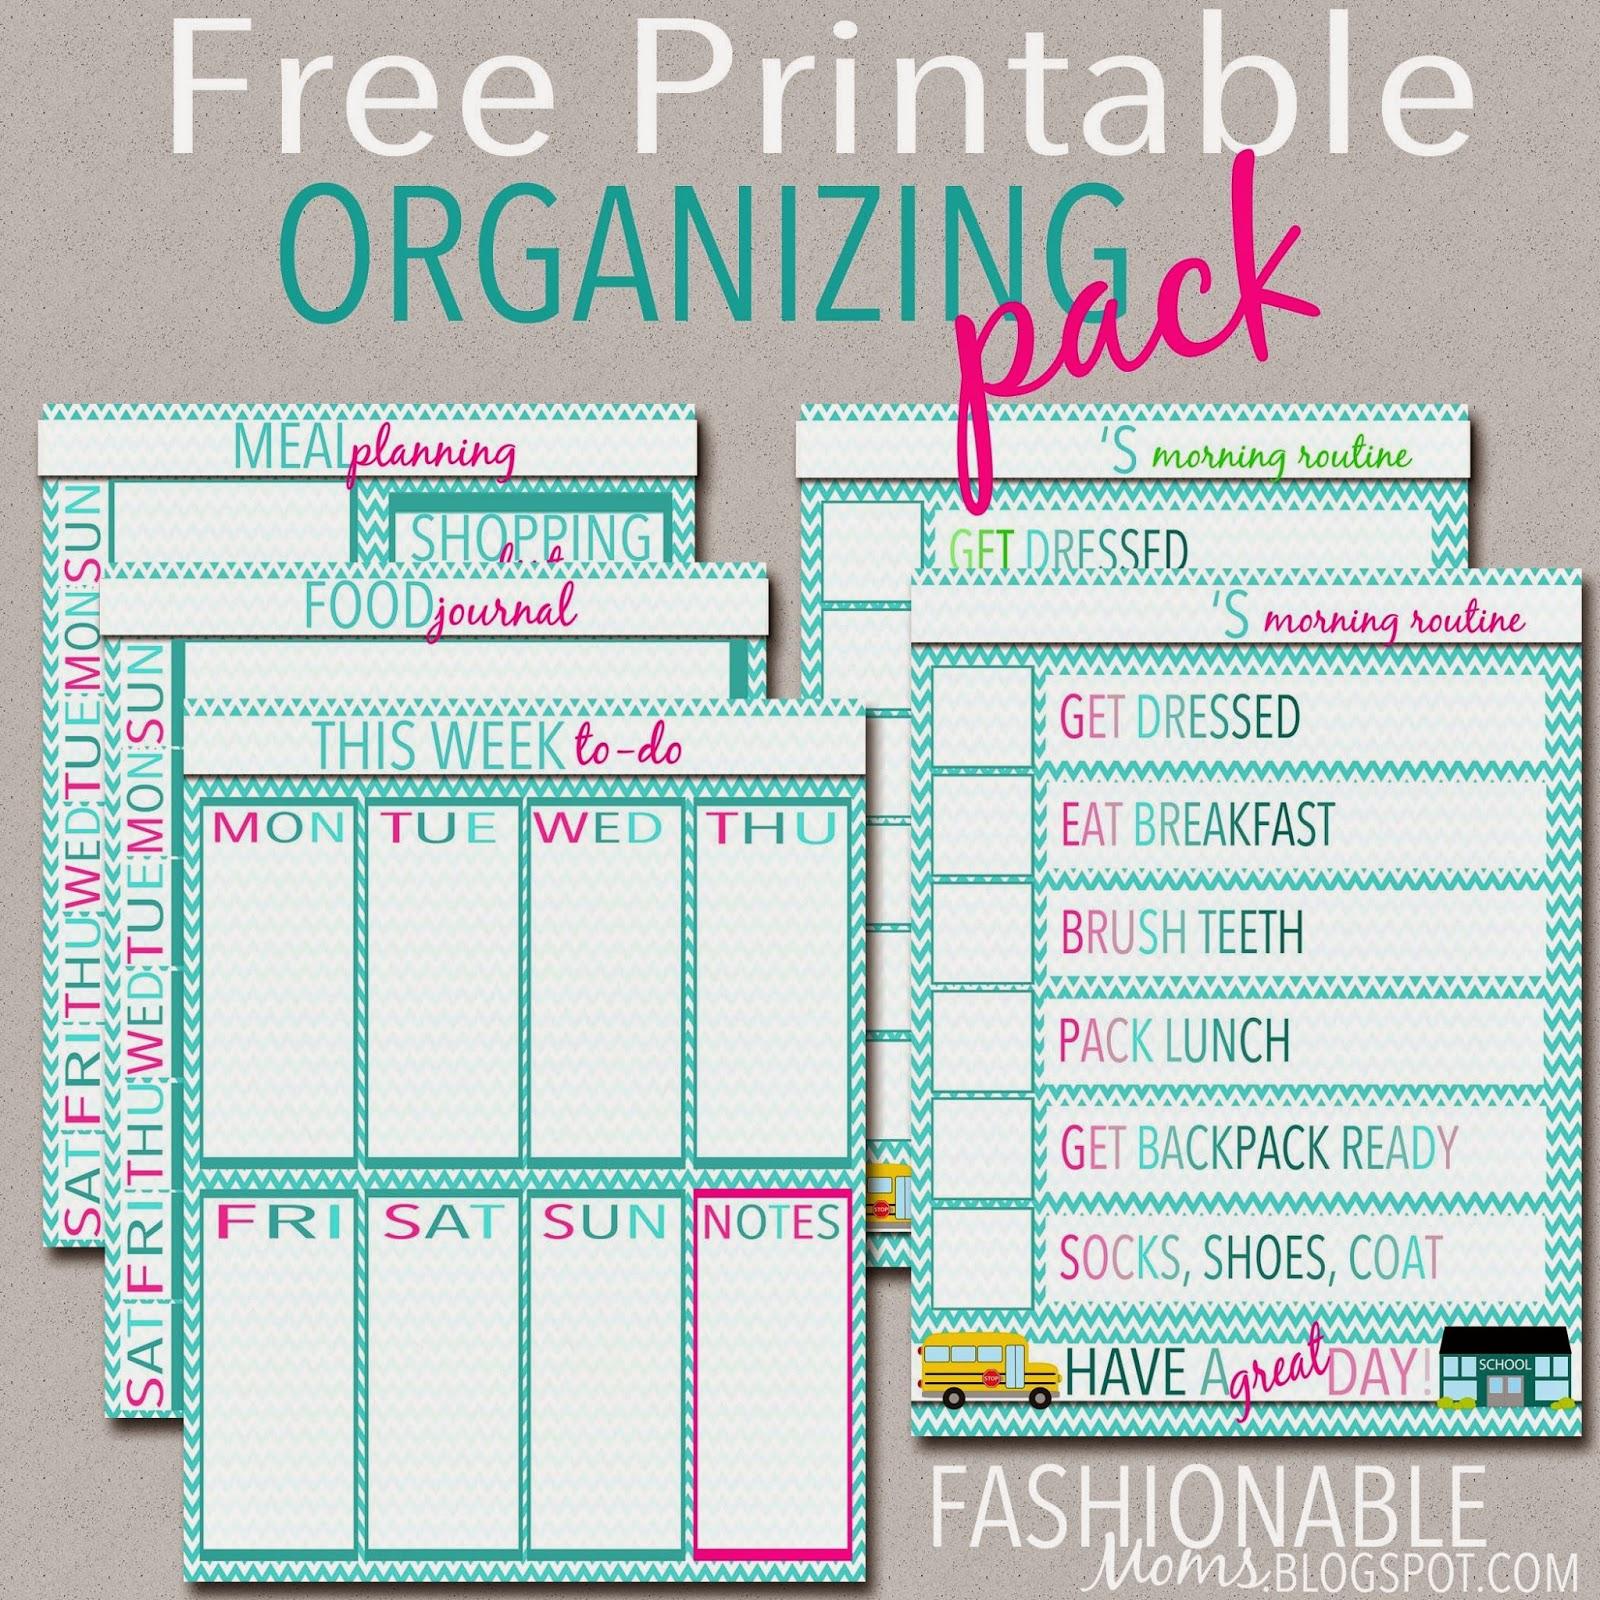 My Fashionable Designs Free Printable Organizing Pack